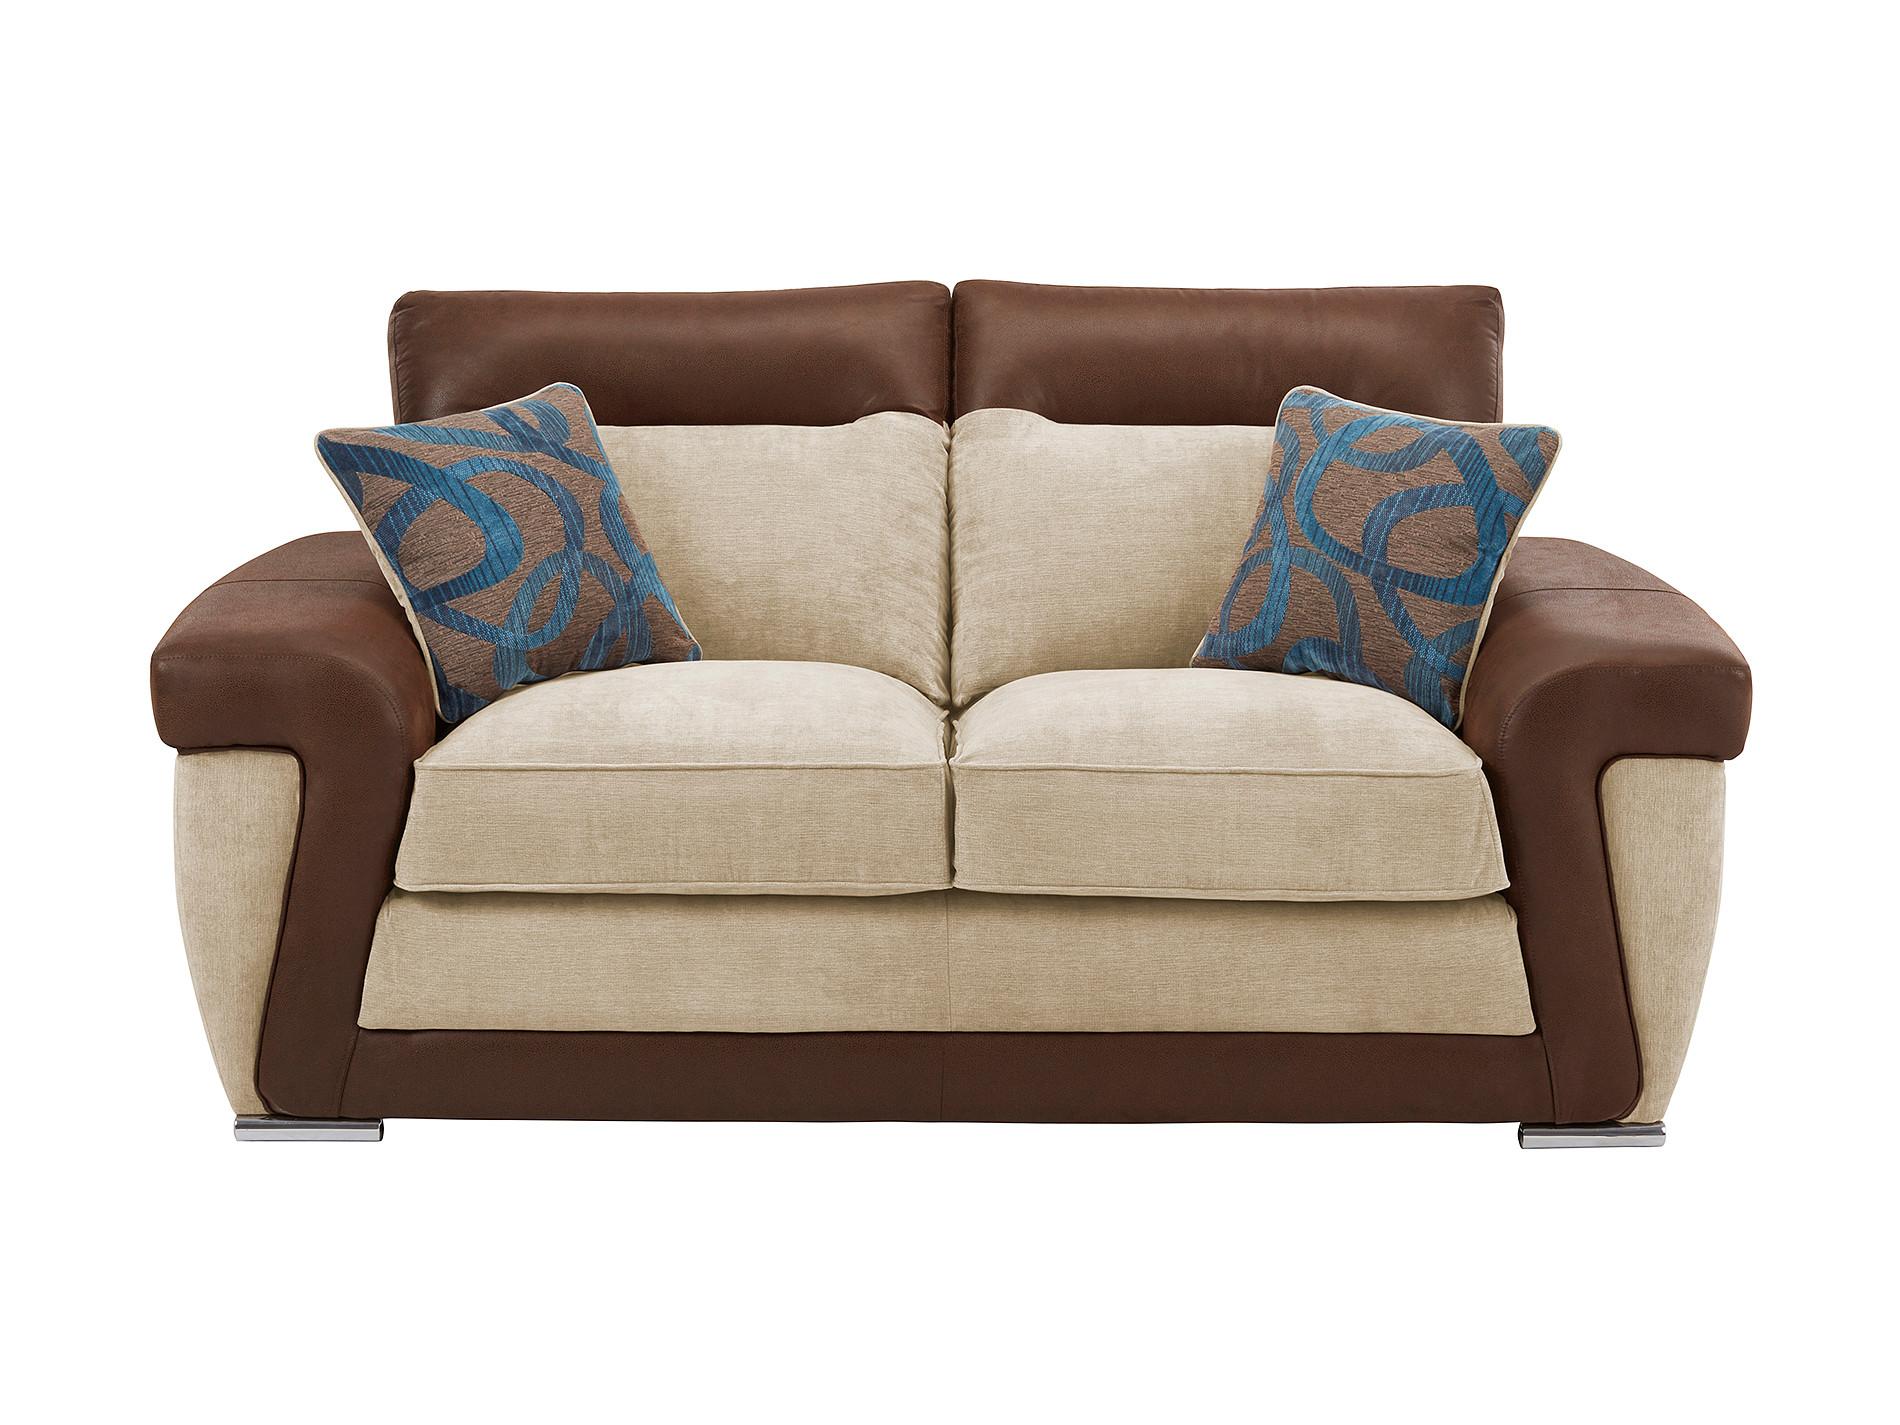 Mason Small Sofa In Grace Taupe